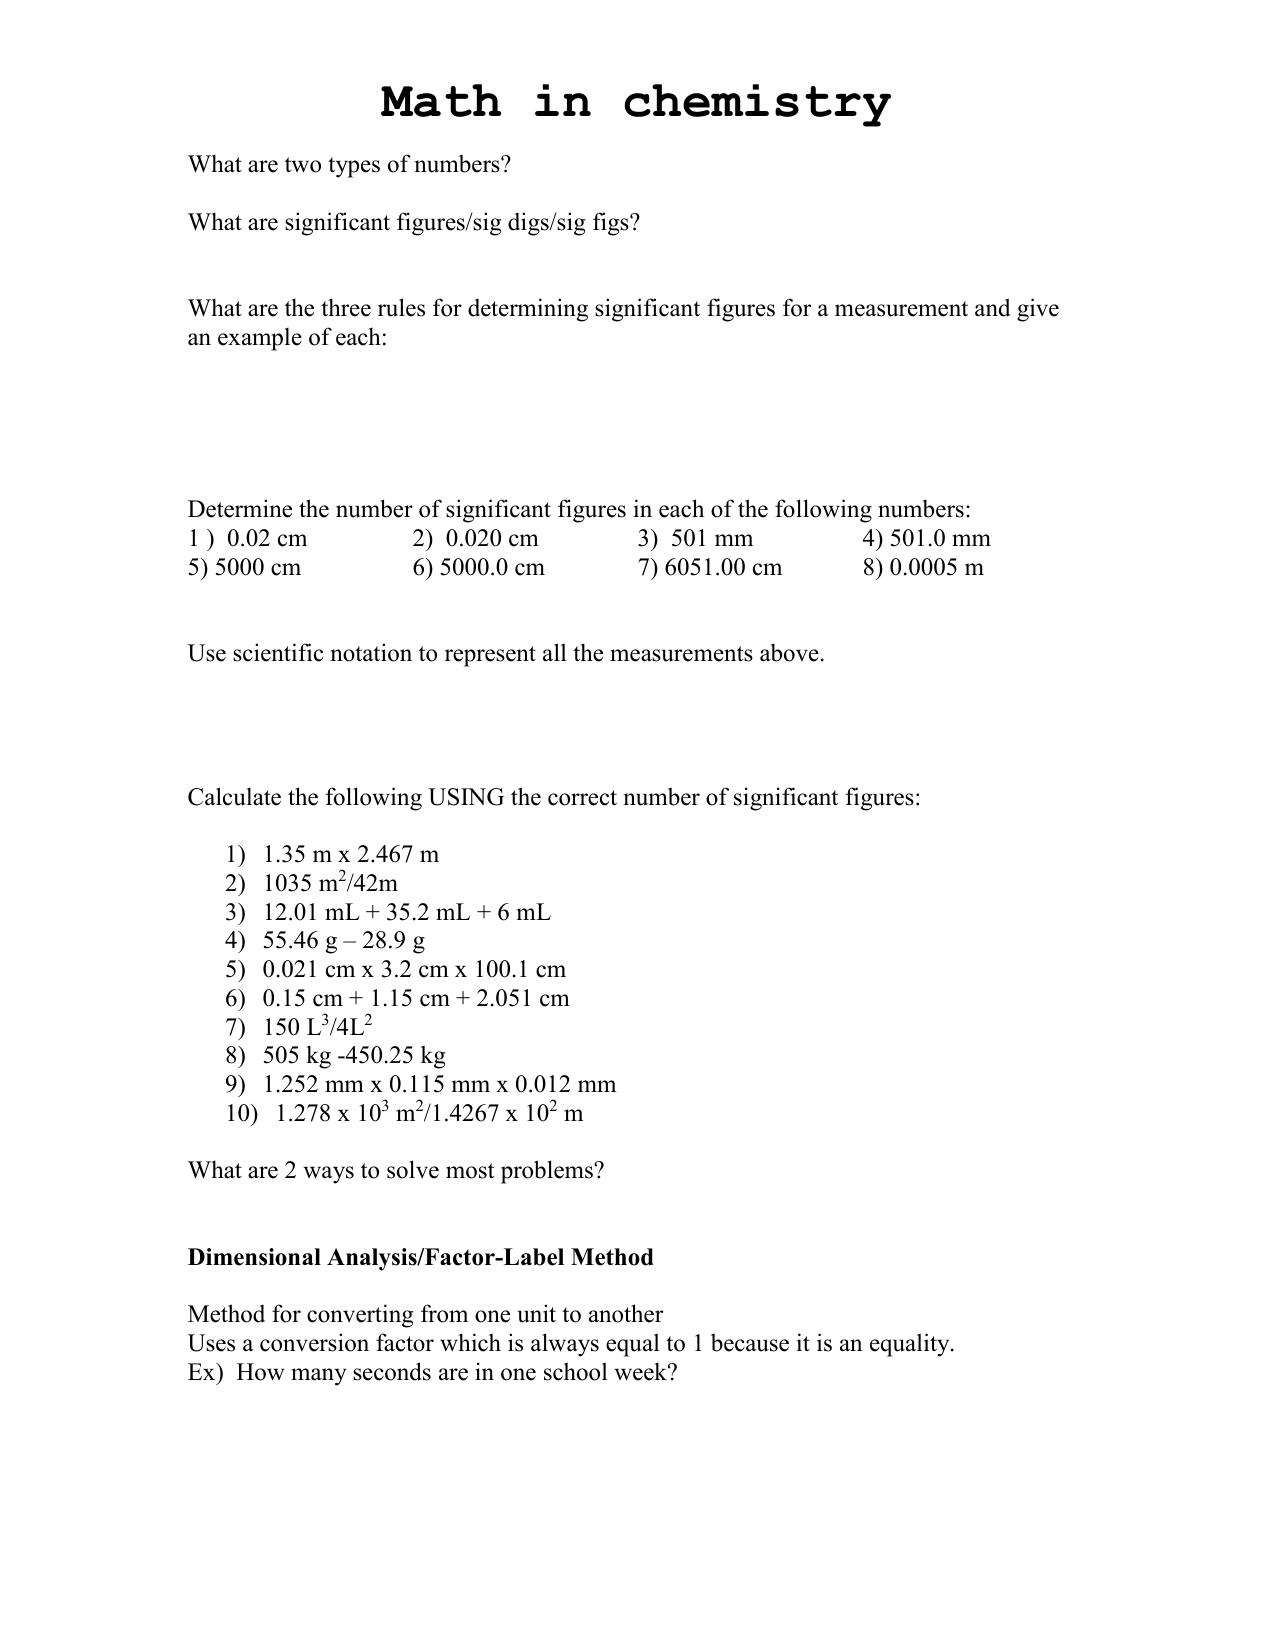 35 Dimensionalysis Factor Label Method Worksheet